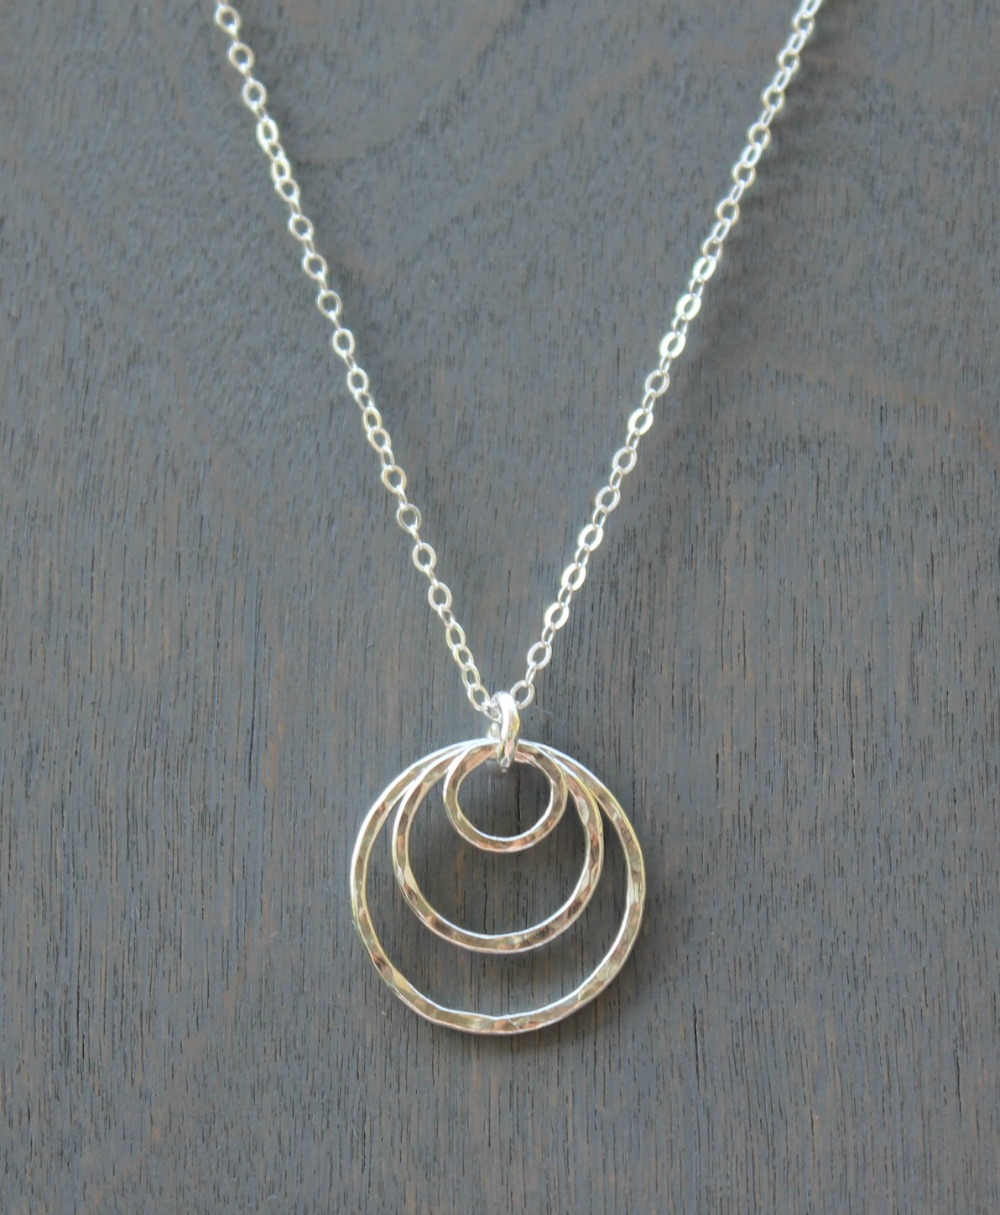 fine silver pendant making jewelry class.jpg